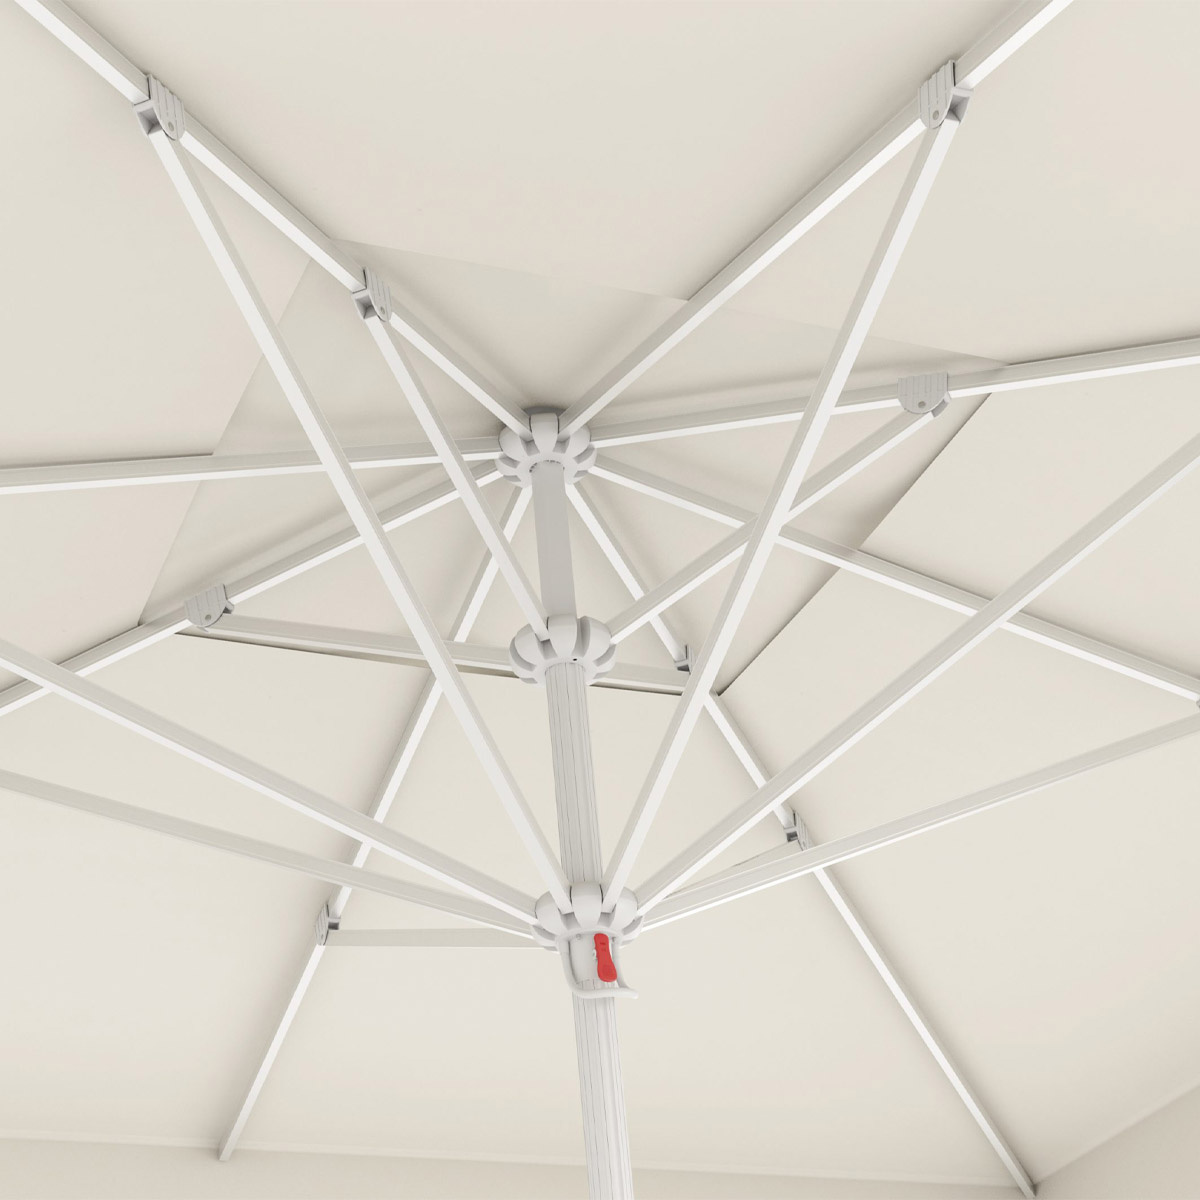 Bahex Parasol Manuel Teleskopik Şemsiye 4 X 4 – KREM